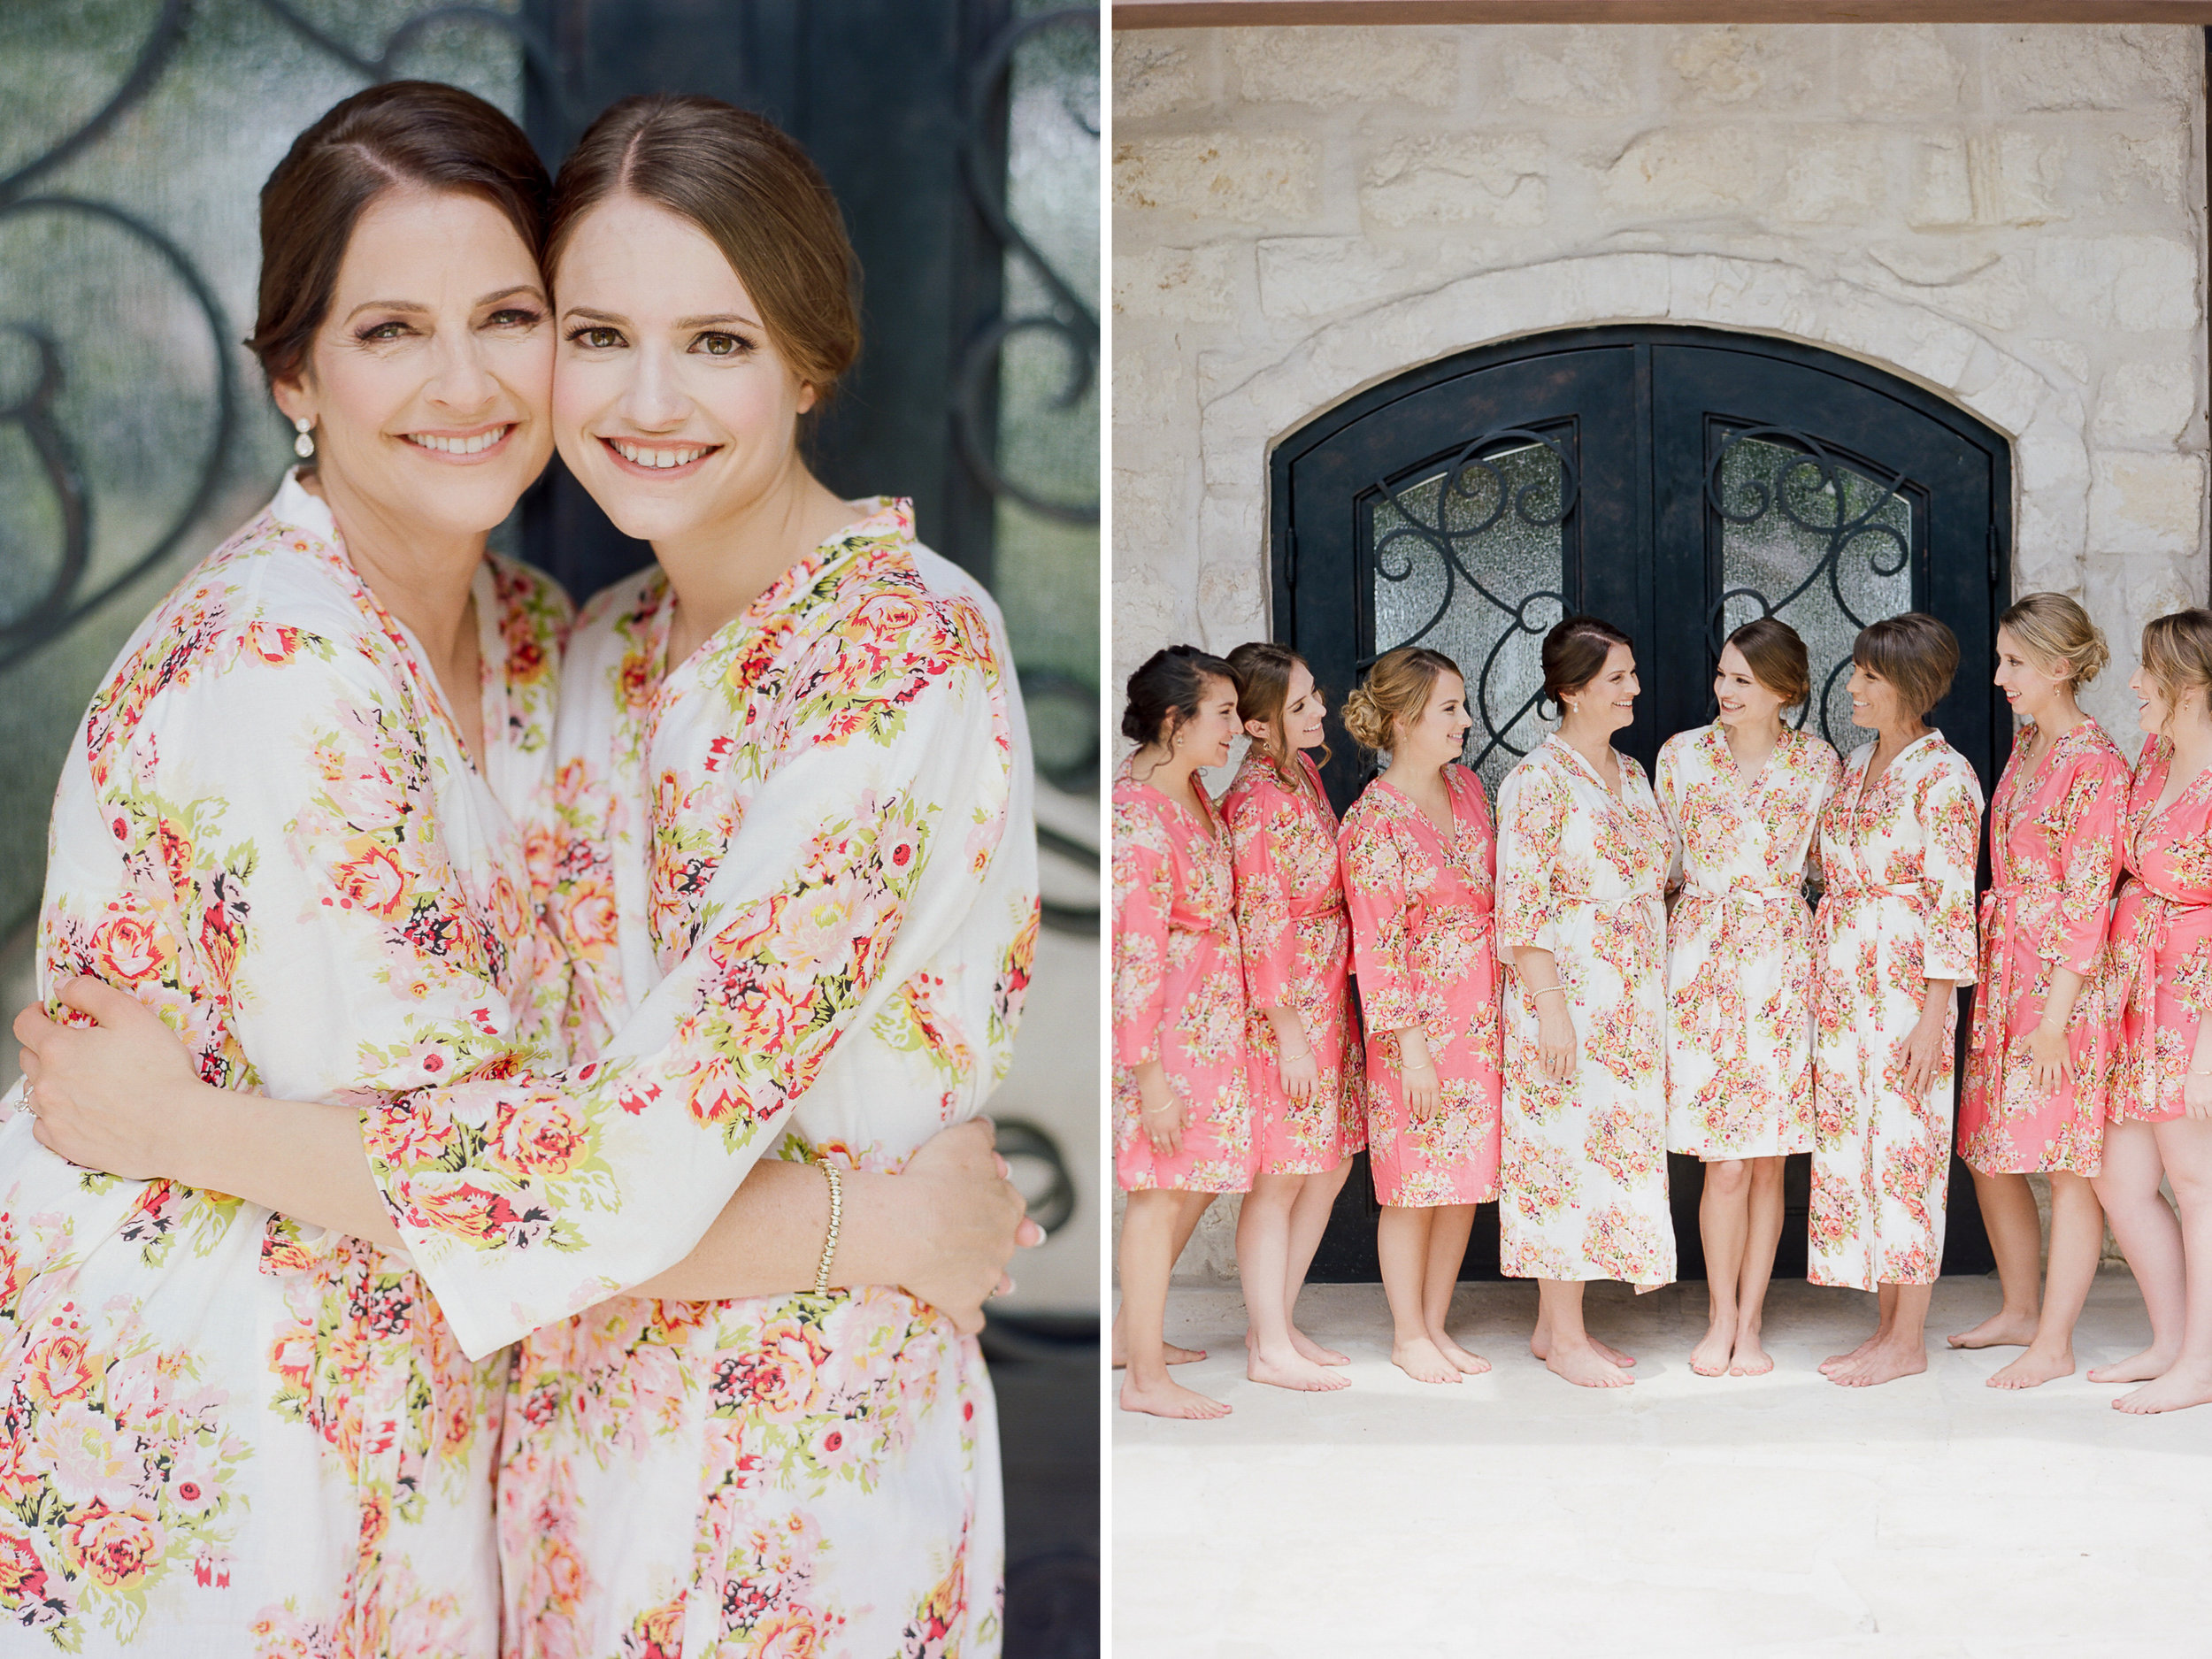 The-Knot-Wedding-Houston-Photographer-Fine-Art-Dana-Fernandez-Photography-Film-103.jpg